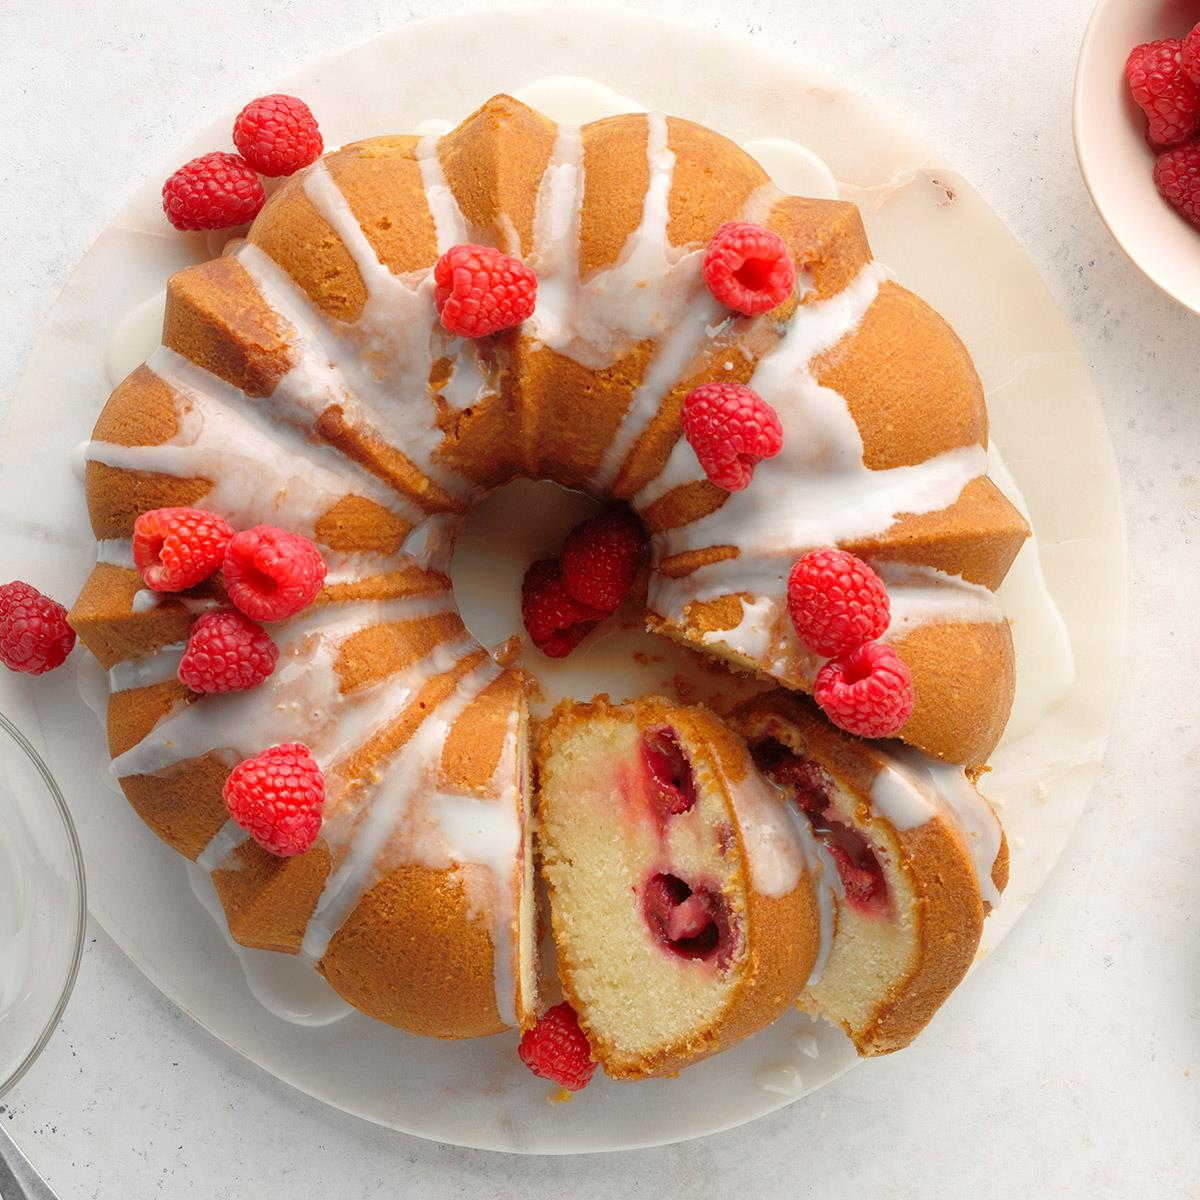 Receta de pastel de frambuesa y mula de Moscú